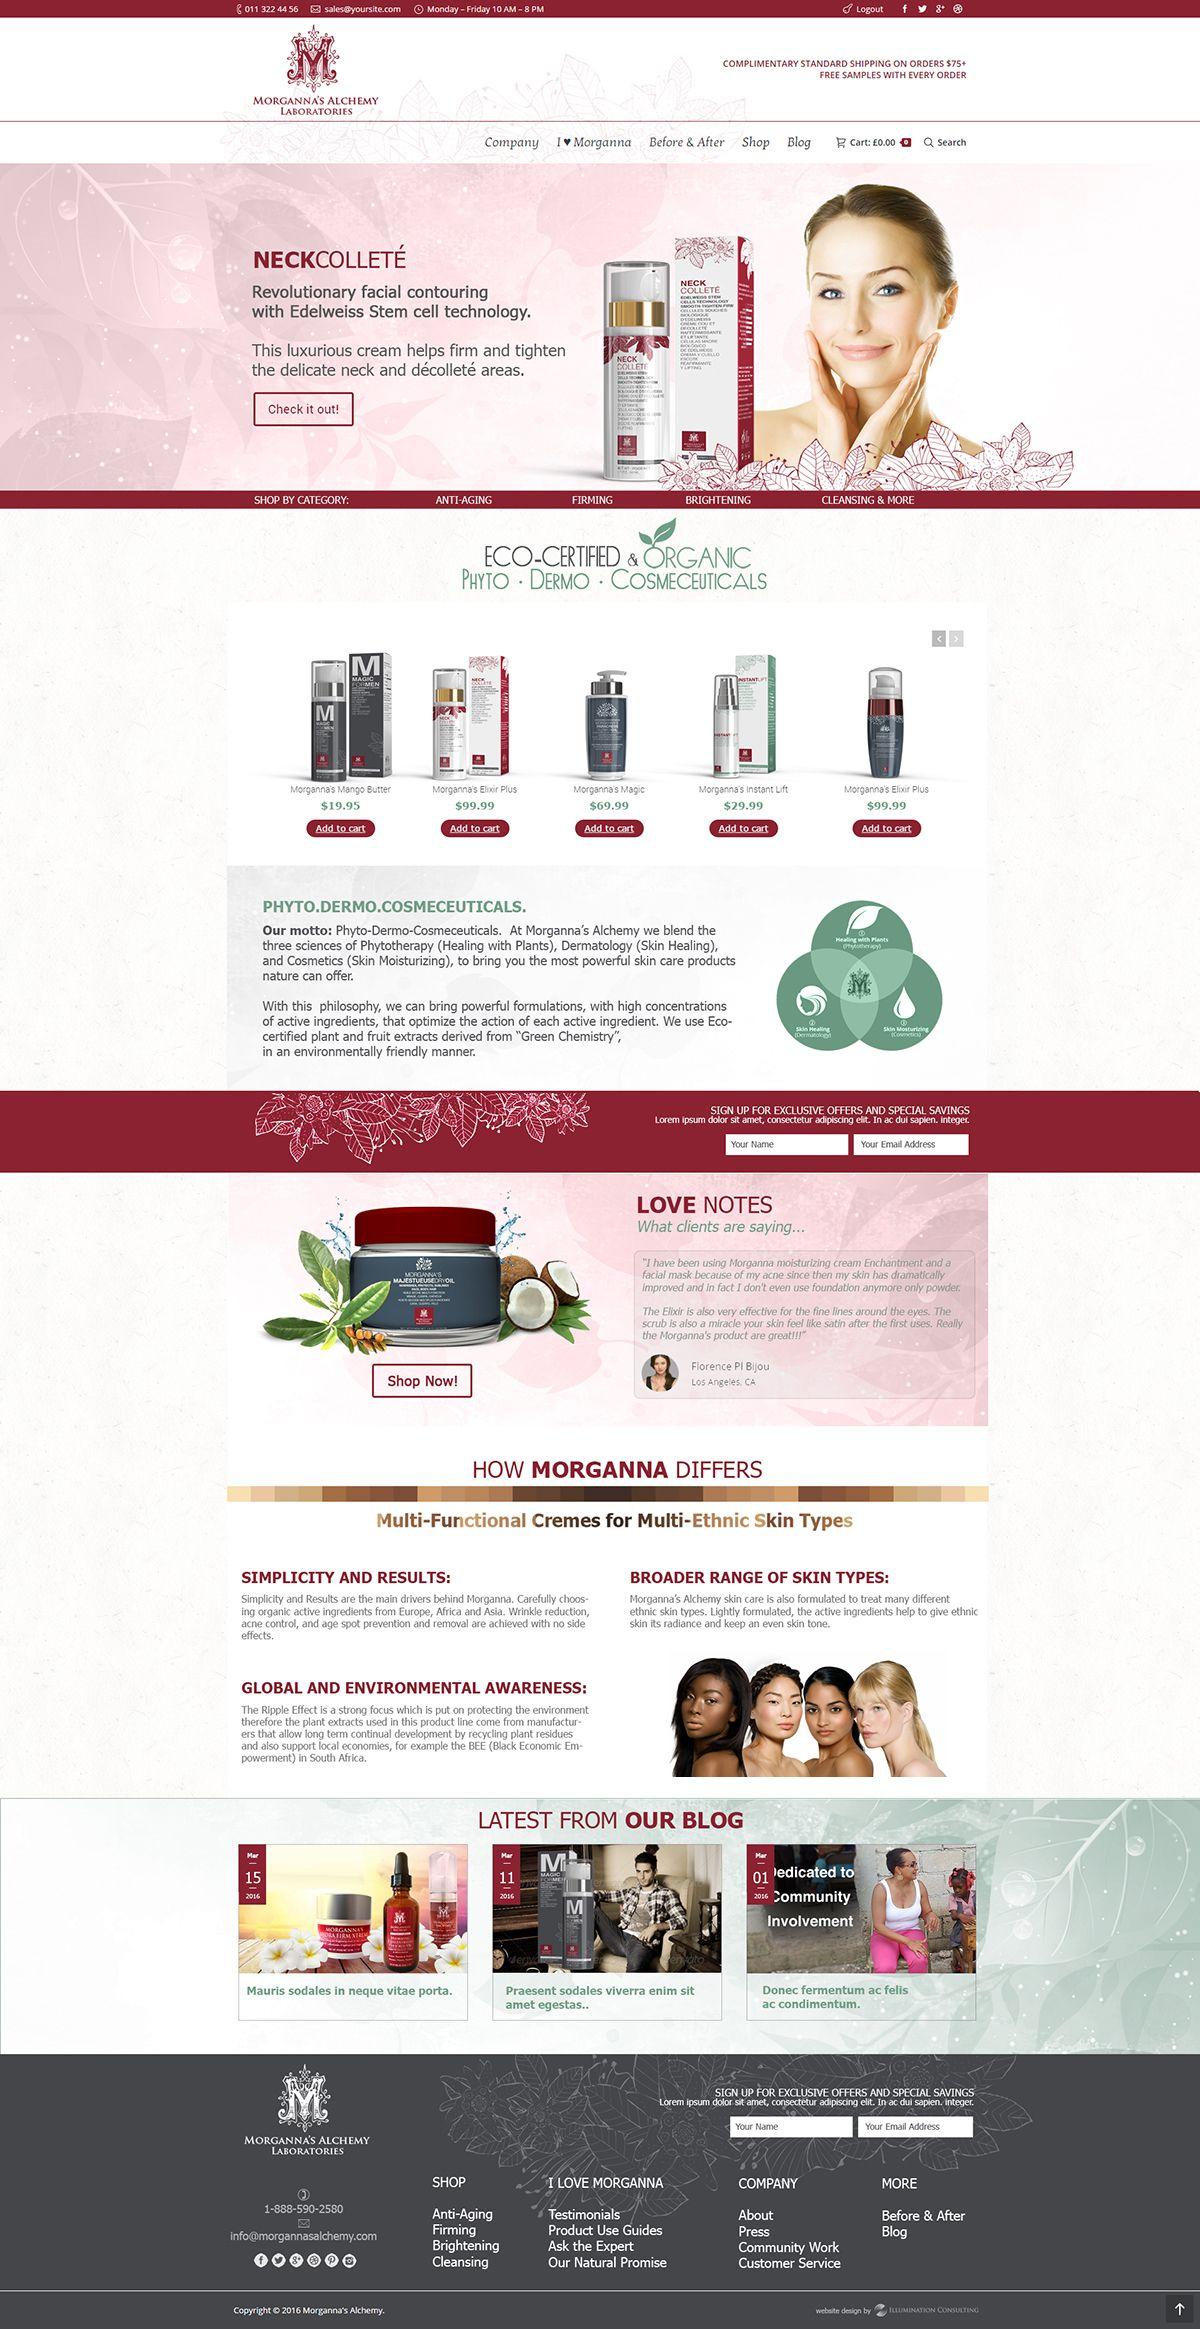 Morganna S Alchemy Skin Care Website Portfolio Illumination Consulting Skin Care Face Products Skincare Beauty Website